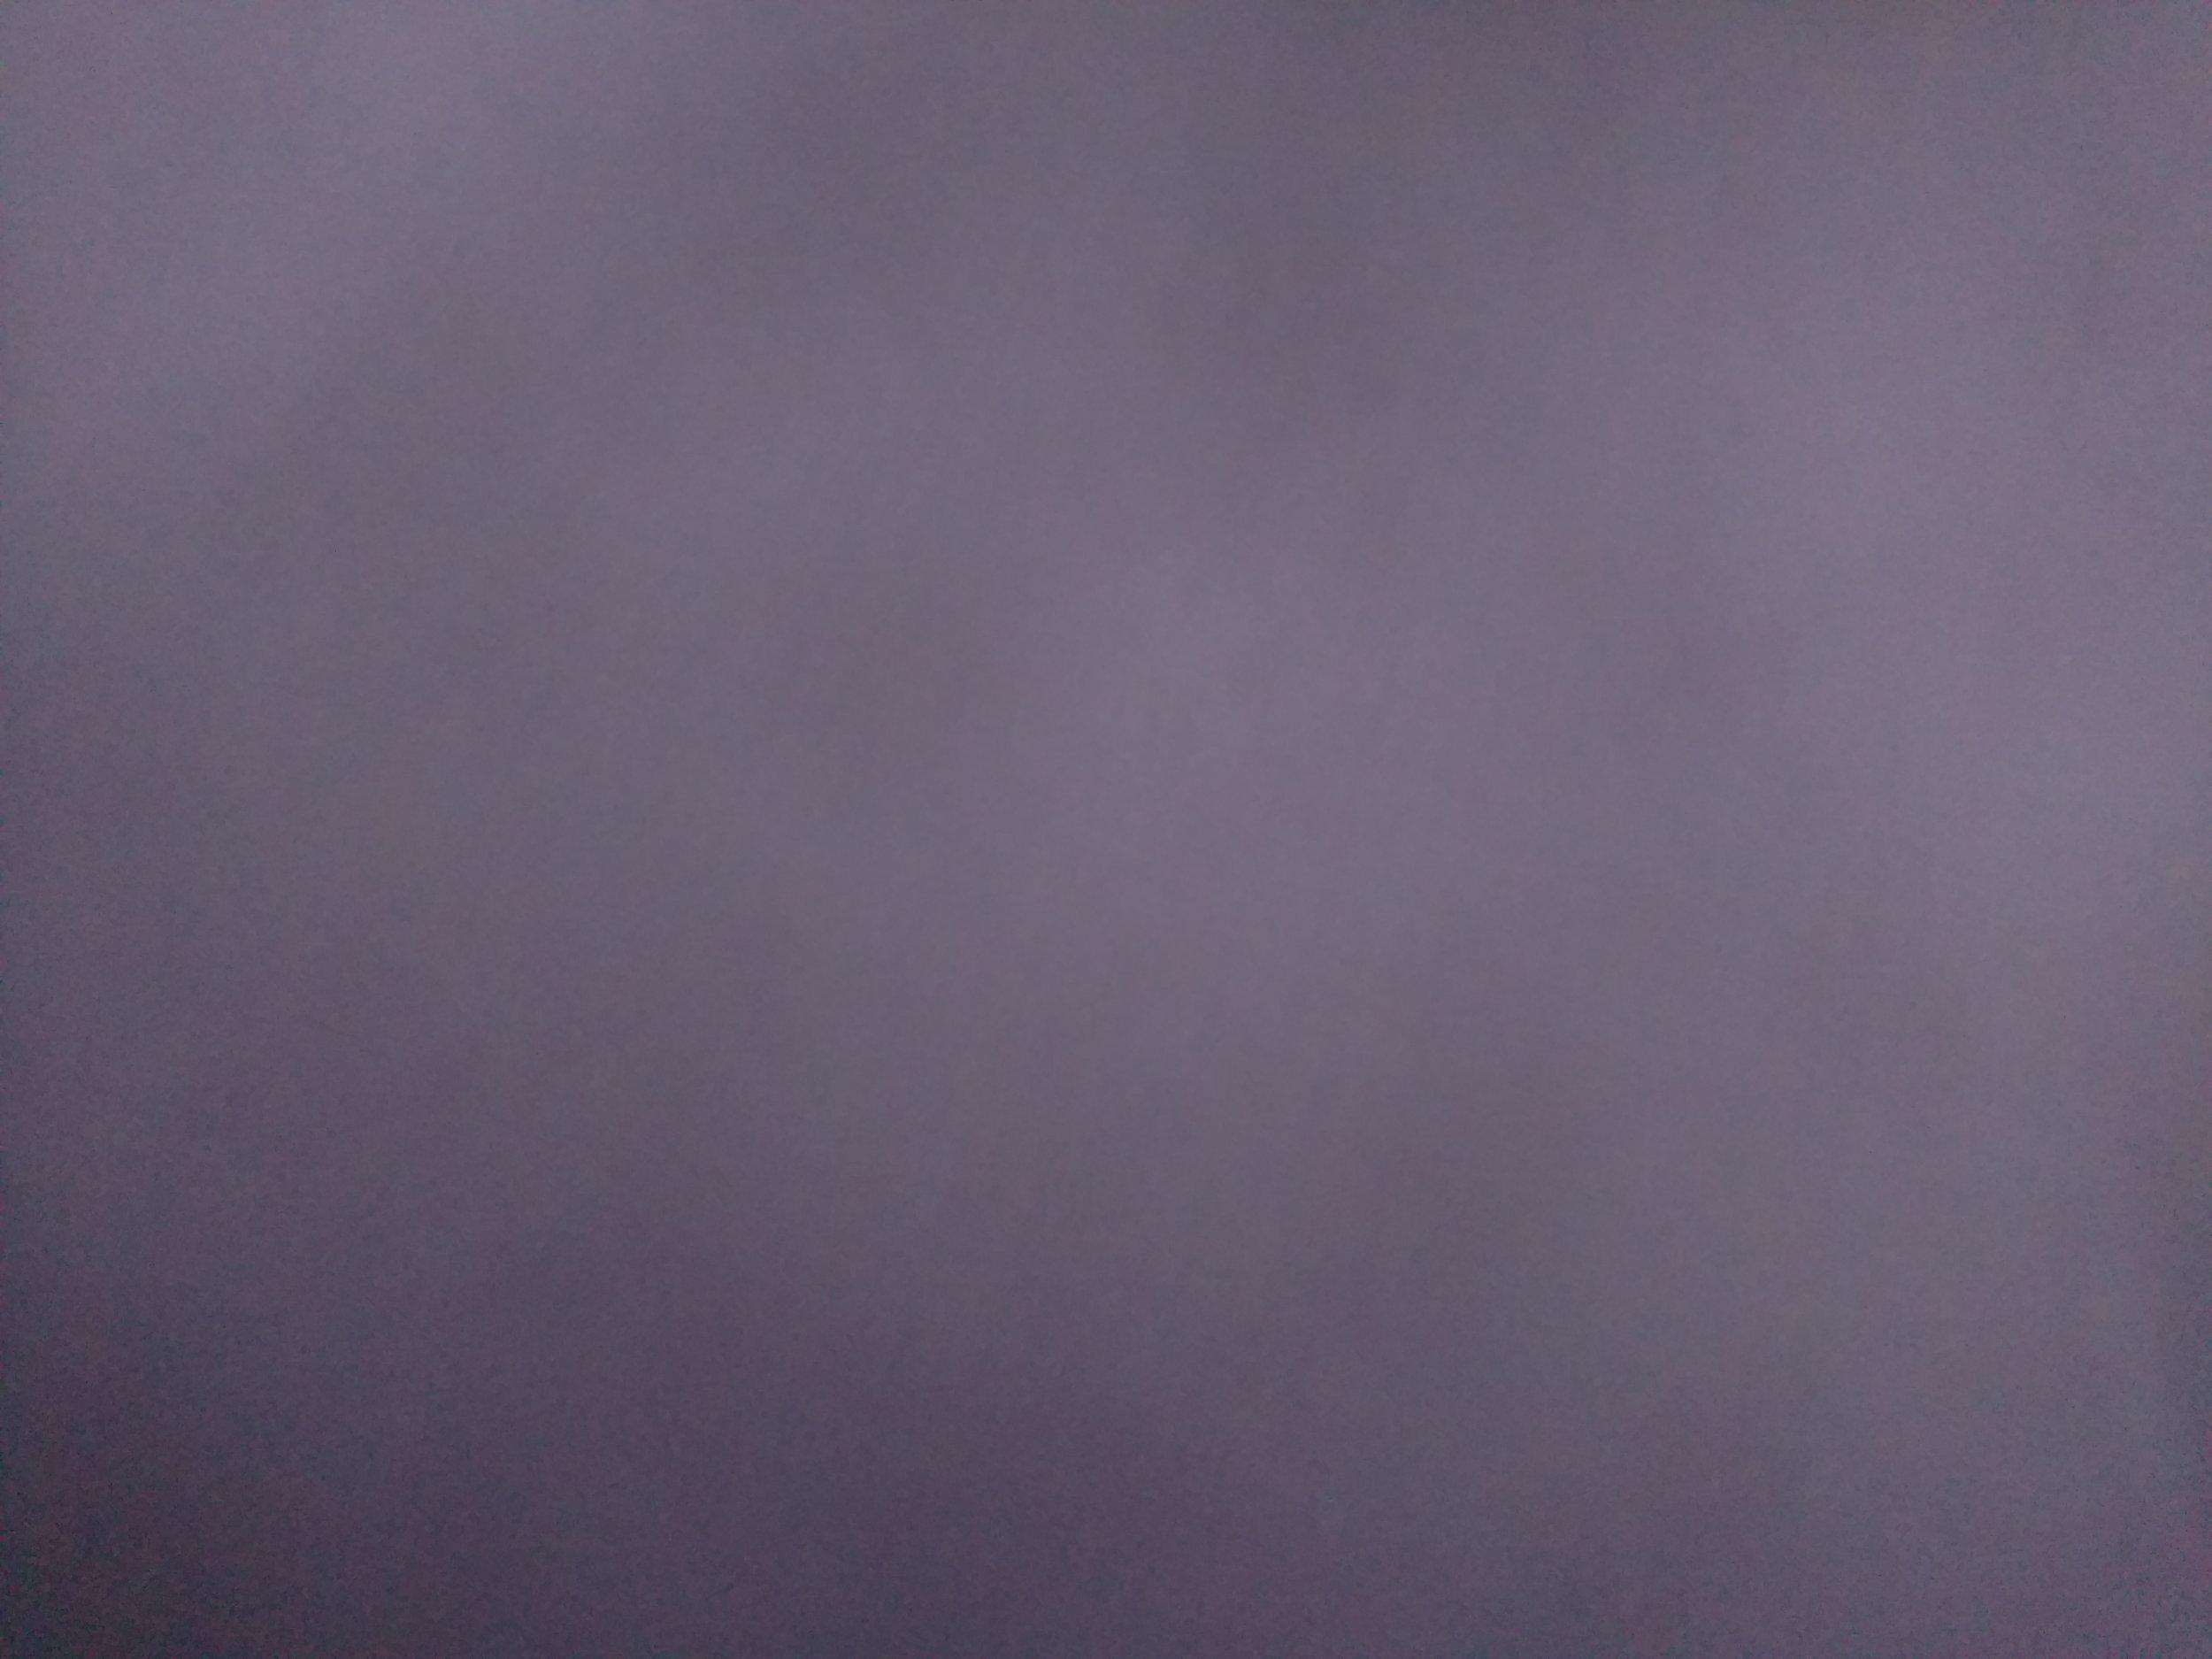 willroth-co-free-texture-gradient-016.jpg